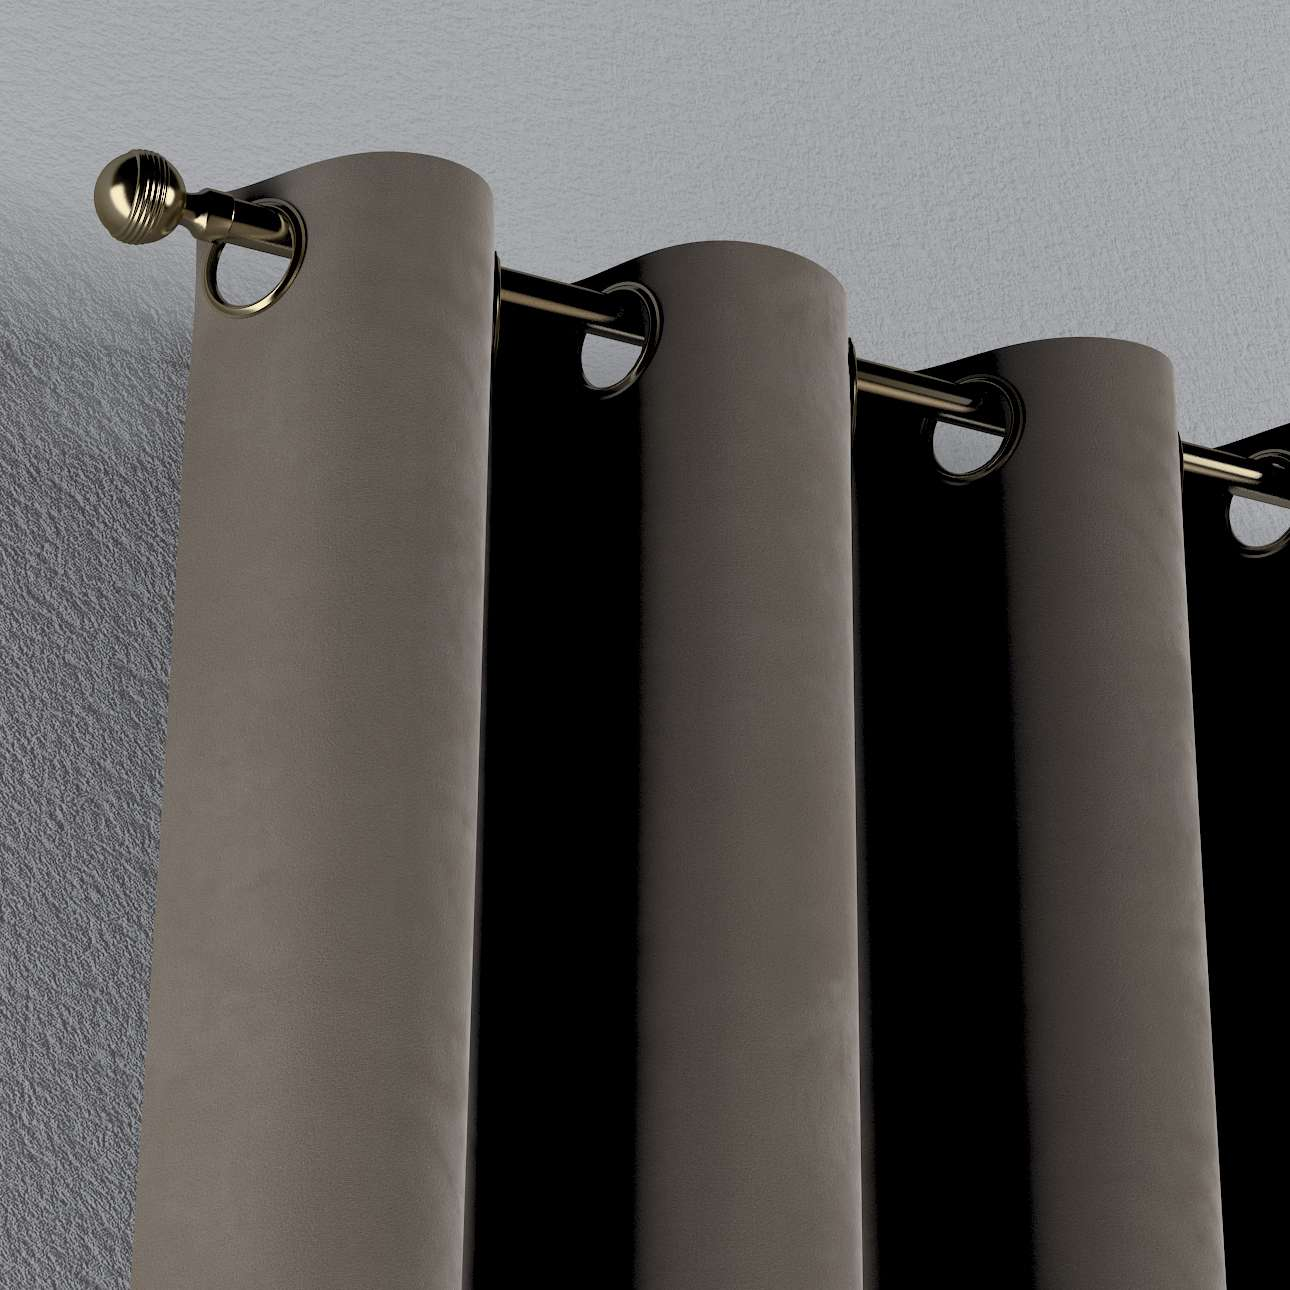 Záves s kolieskami V kolekcii Velvet, tkanina: 704-19